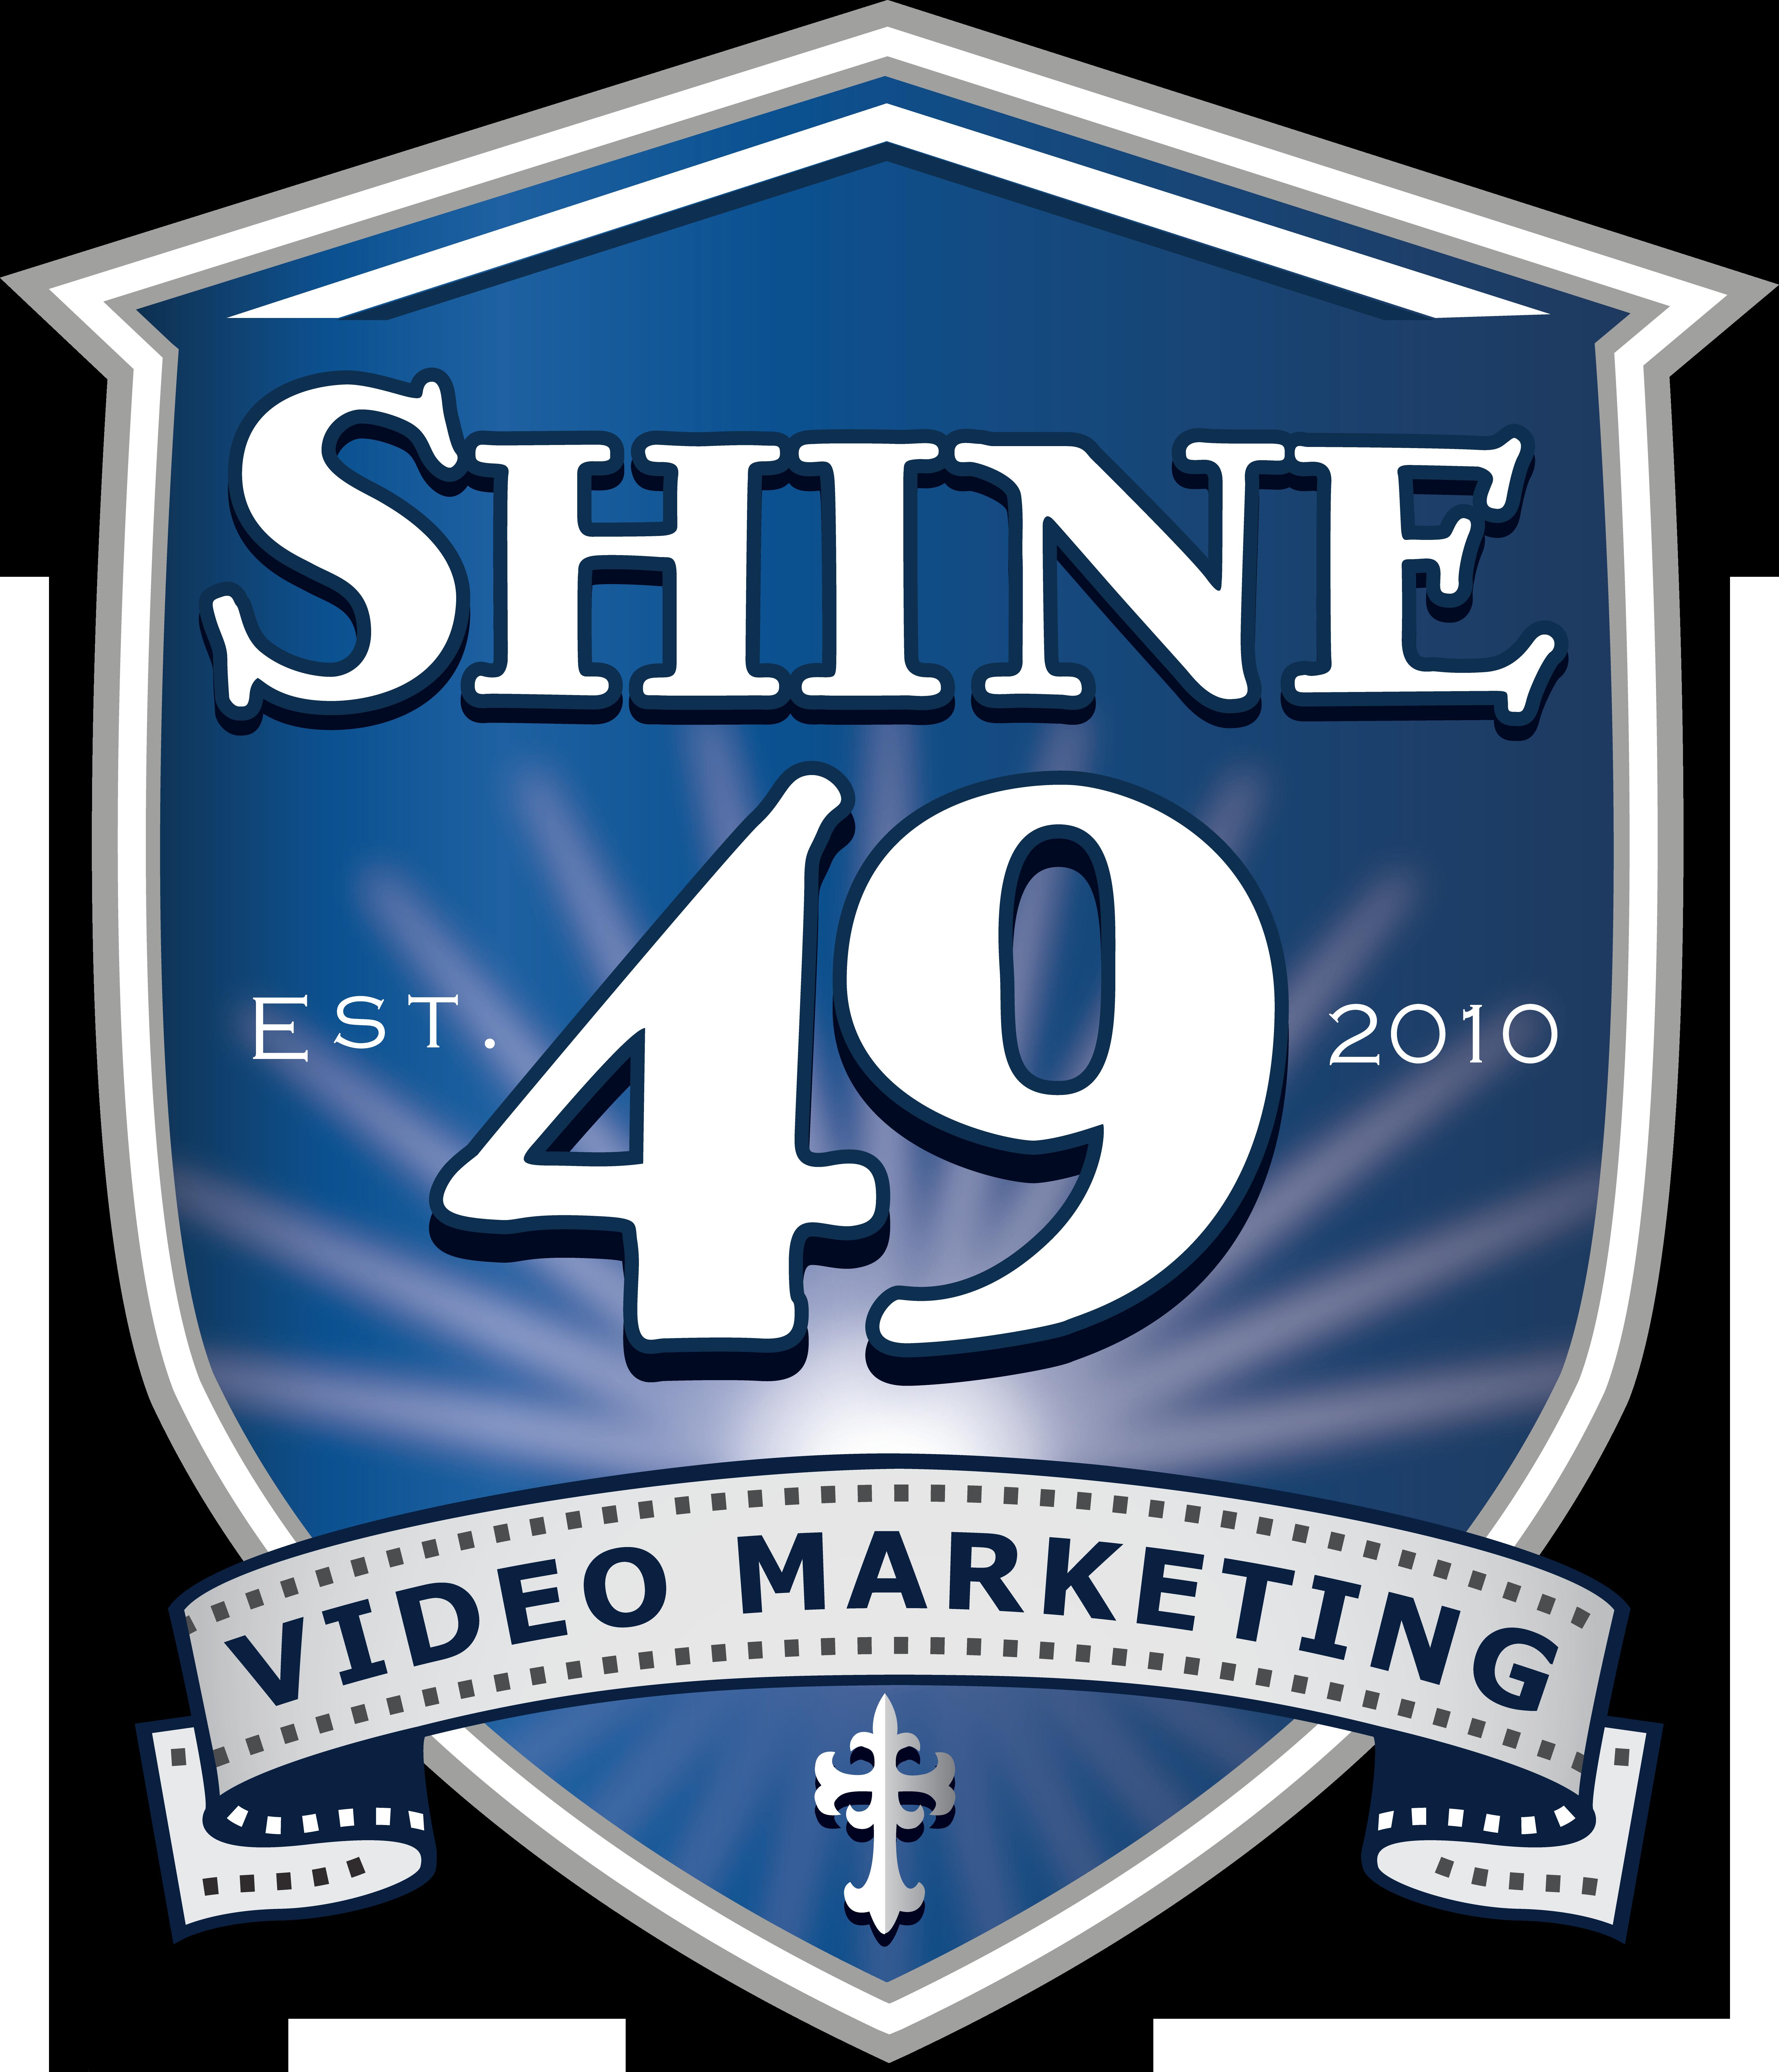 Shine 49 Video Marketing logo